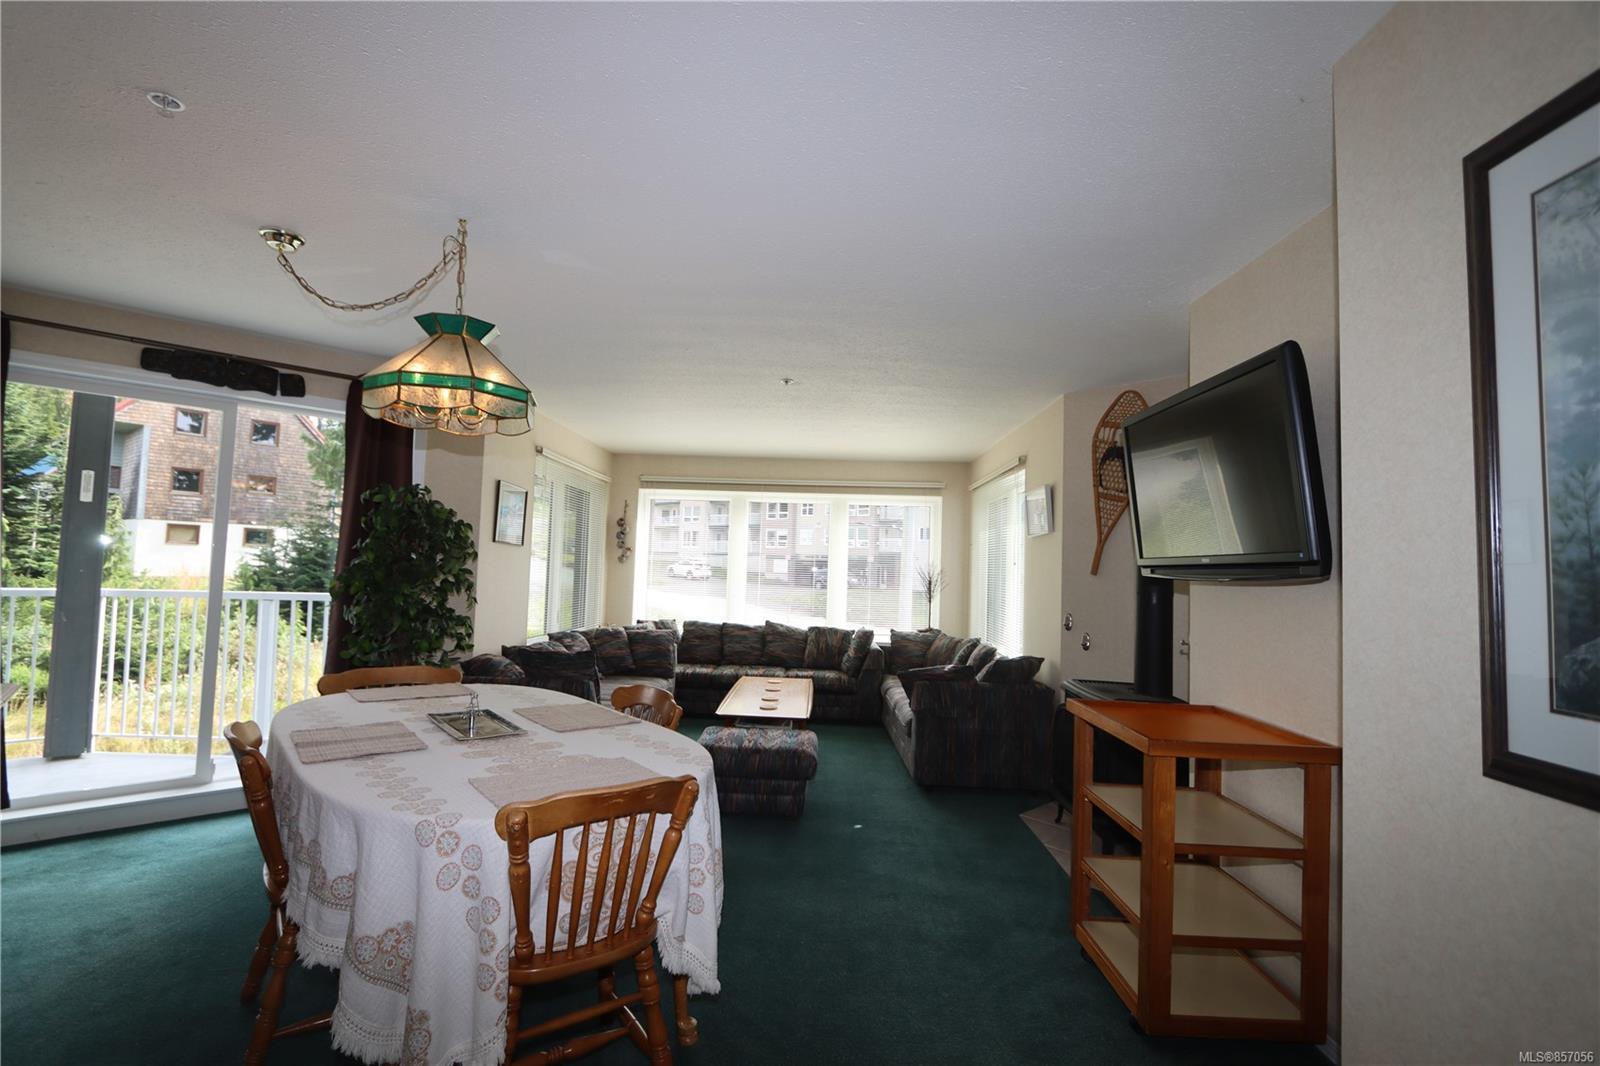 Photo 18: Photos: 118 1320 Henry Rd in : CV Mt Washington Condo for sale (Comox Valley)  : MLS®# 857056